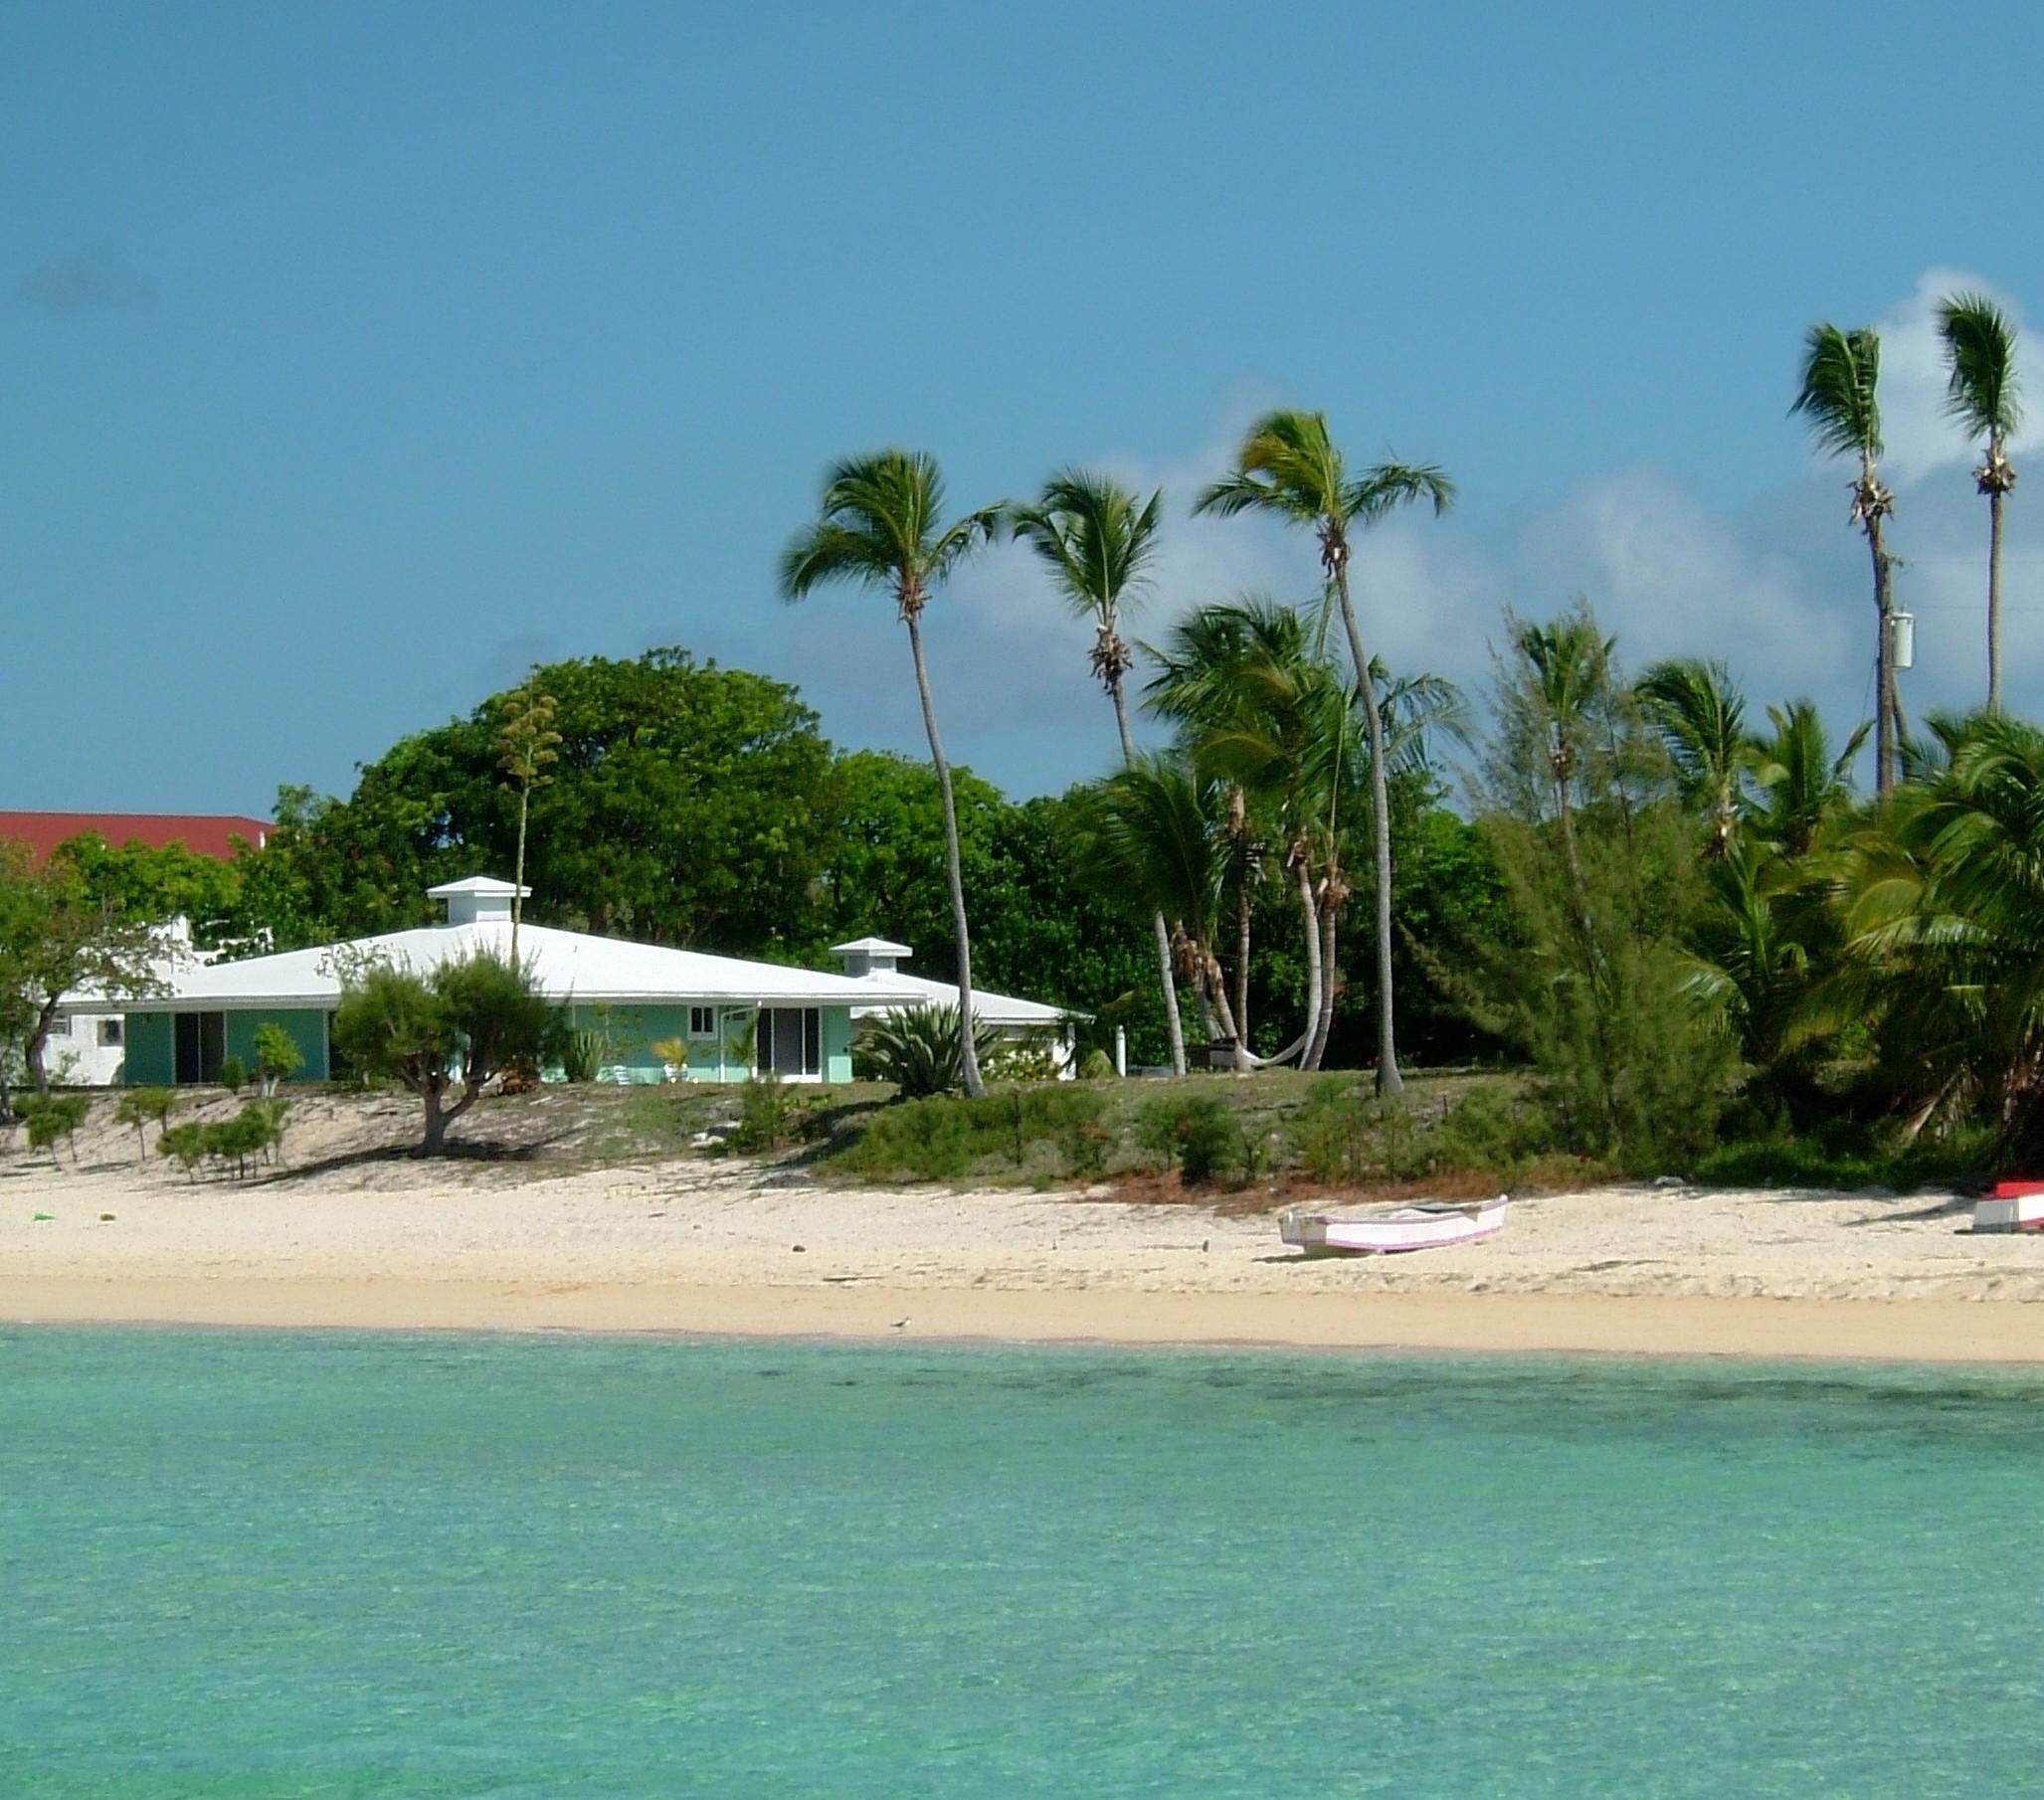 The Barefoot Beach House